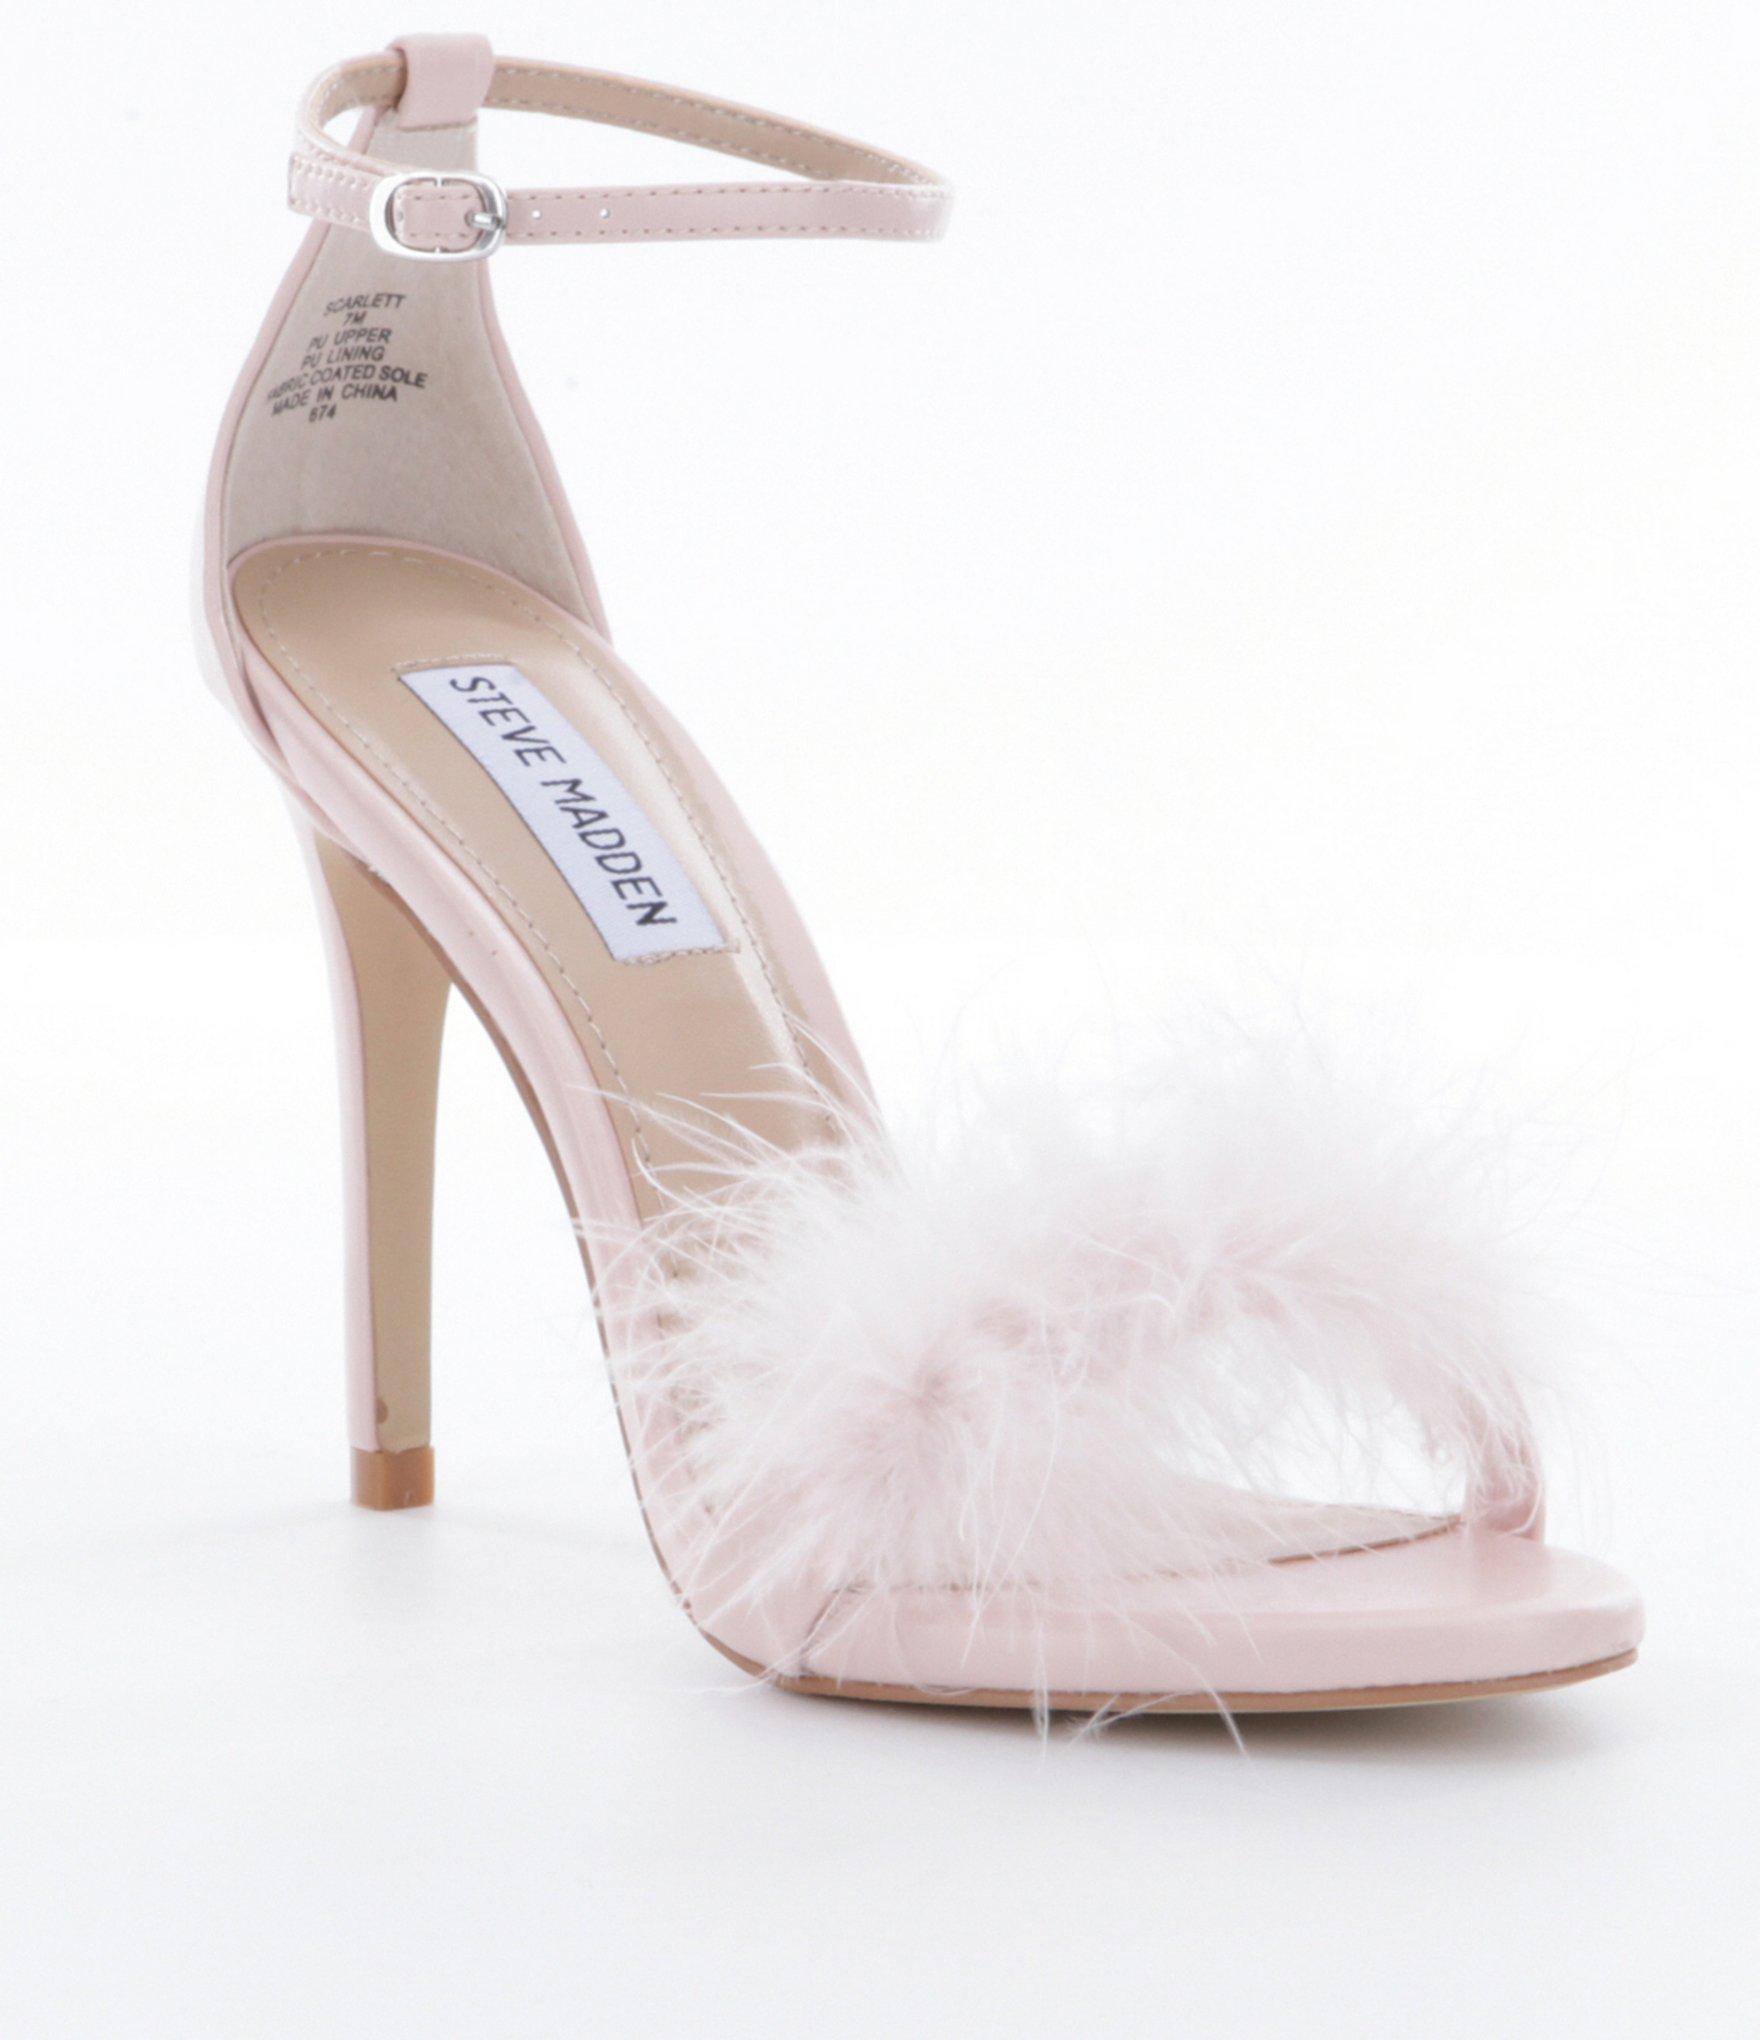 6b47f6047a8 Lyst steve madden scarlett dress sandals in pink jpg 1760x2040 Steve and  scarlett